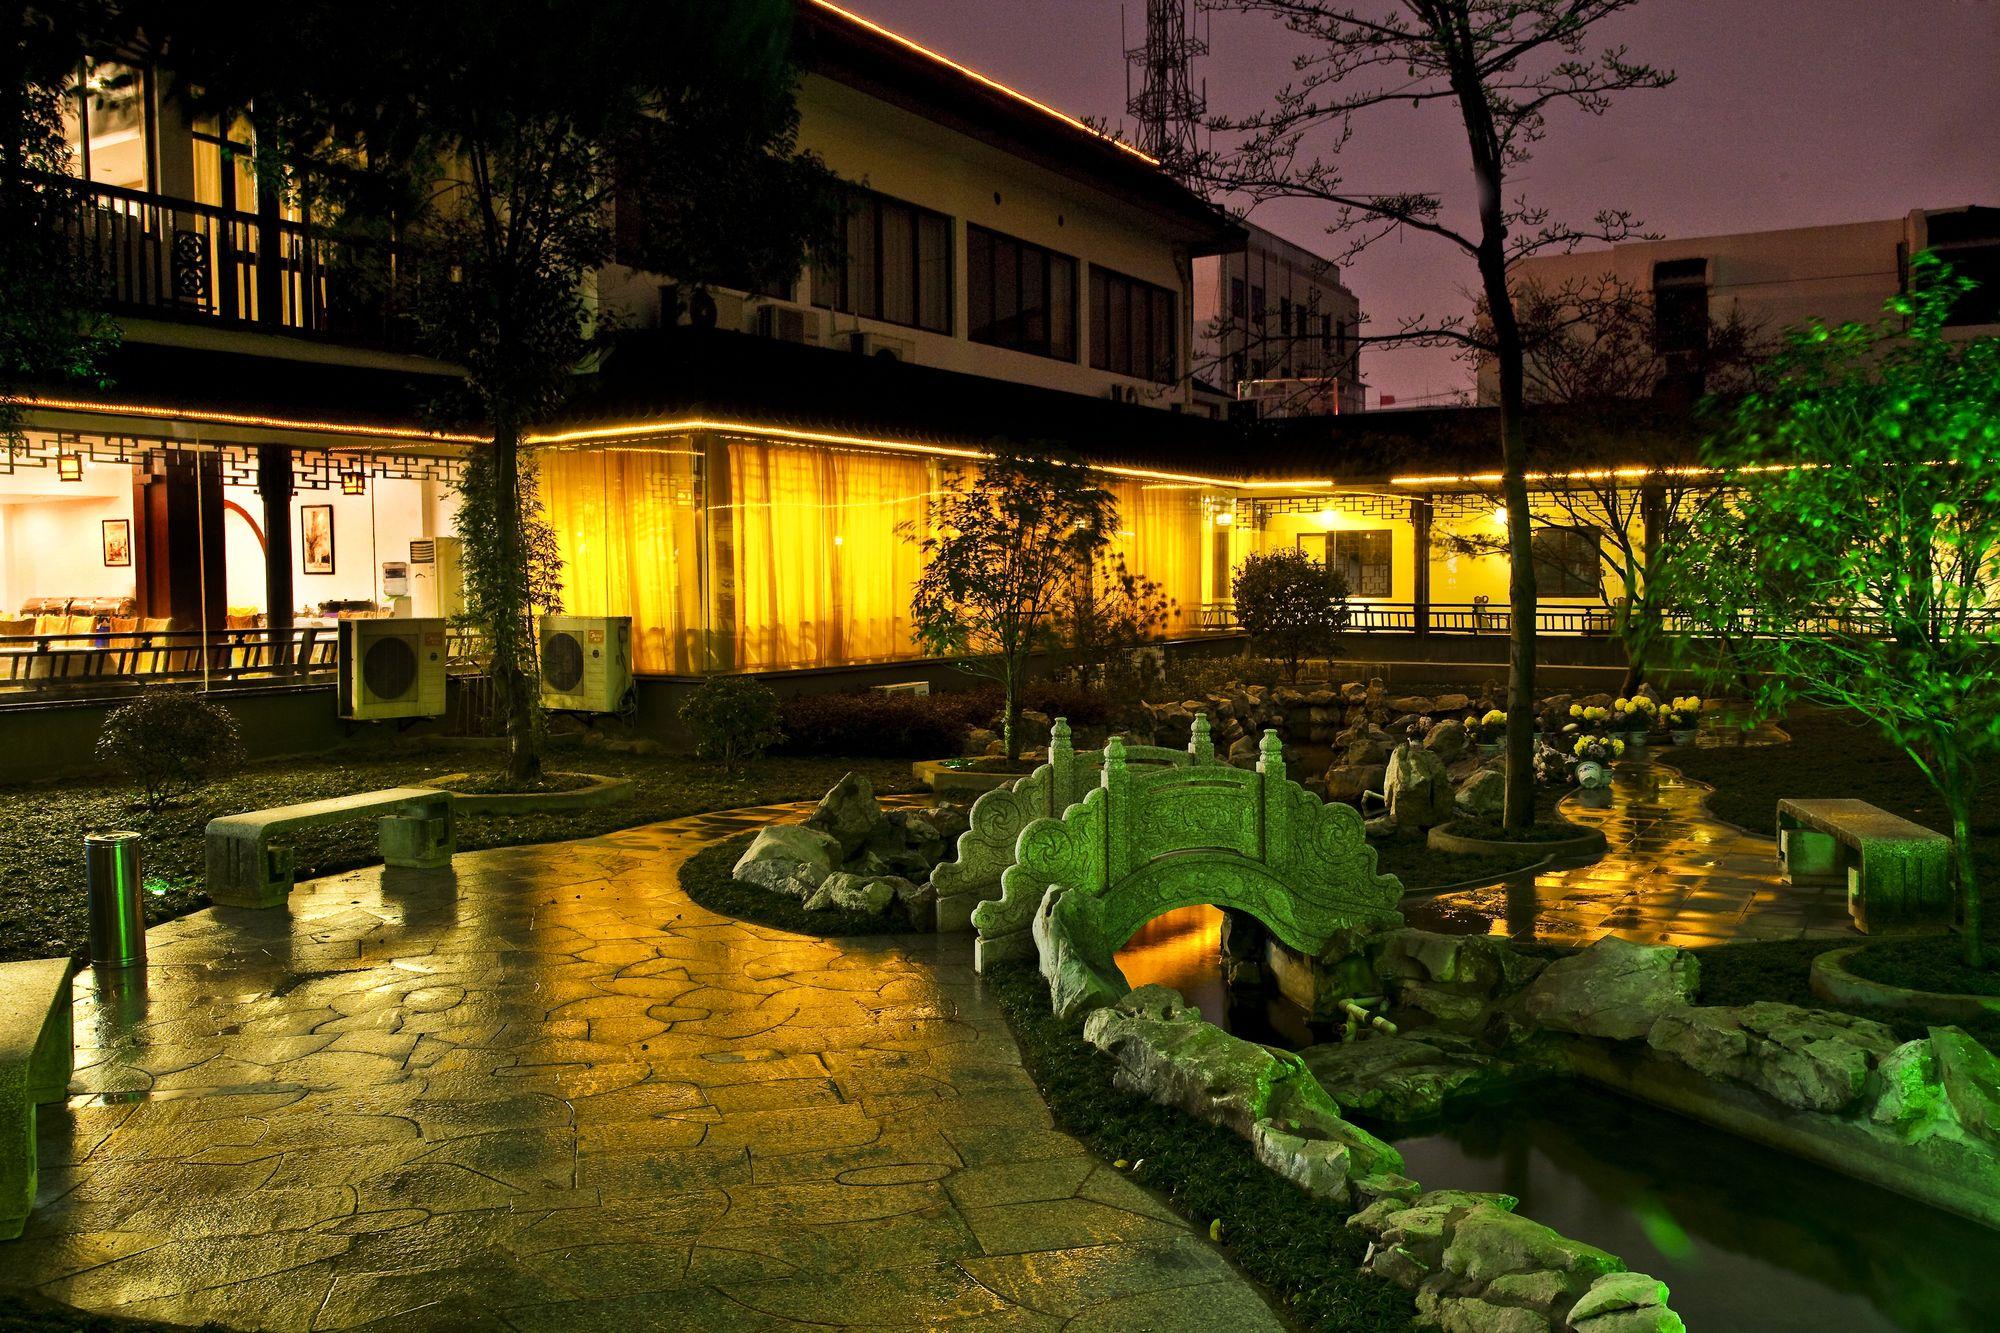 Suzhou Friendship Hotel